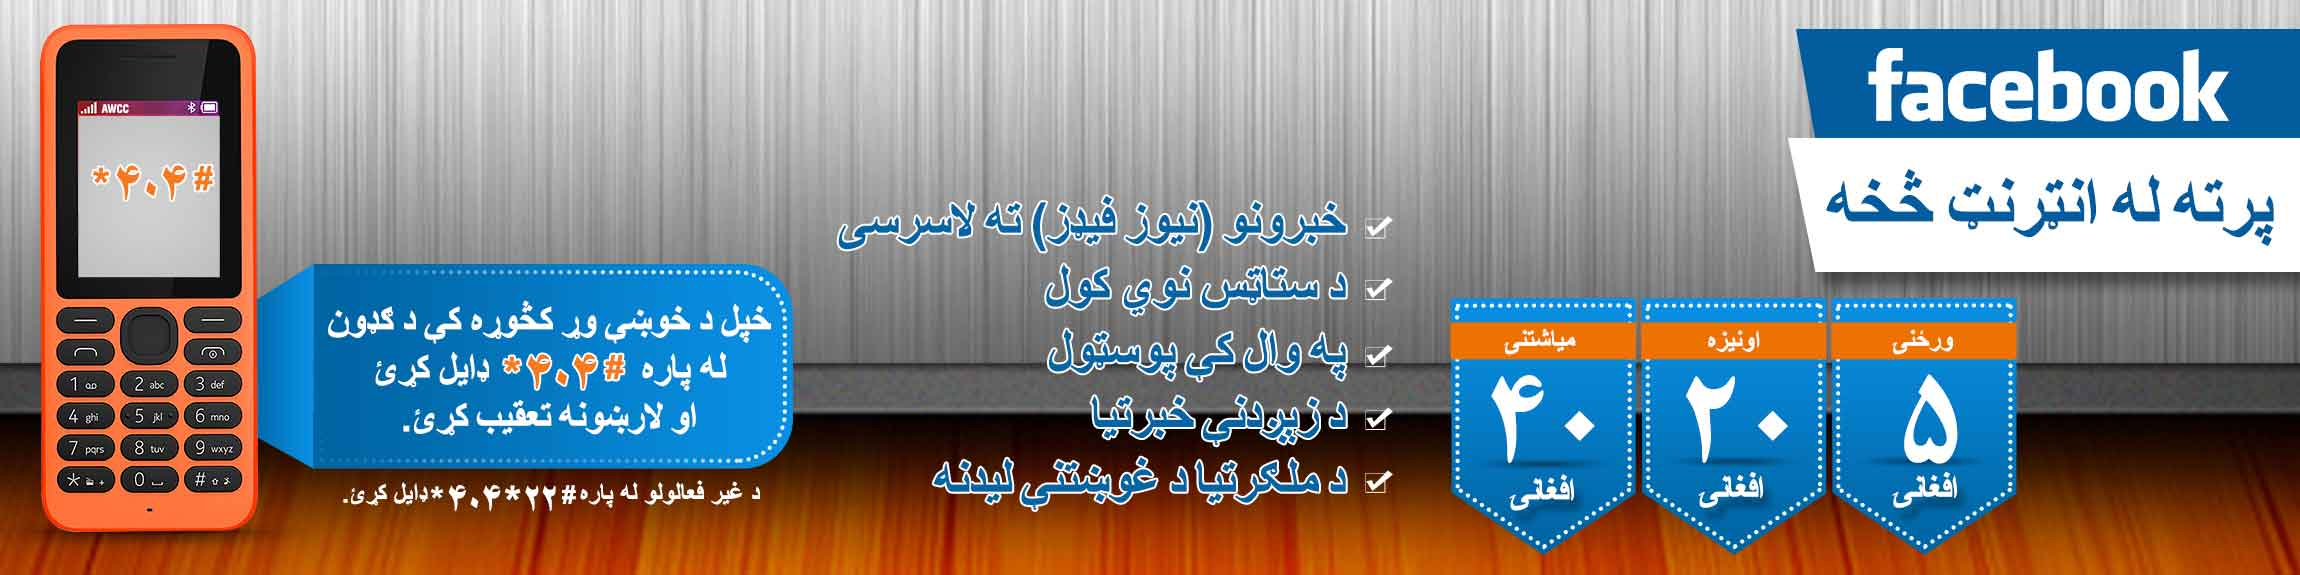 facebook-ussd-pashto-website